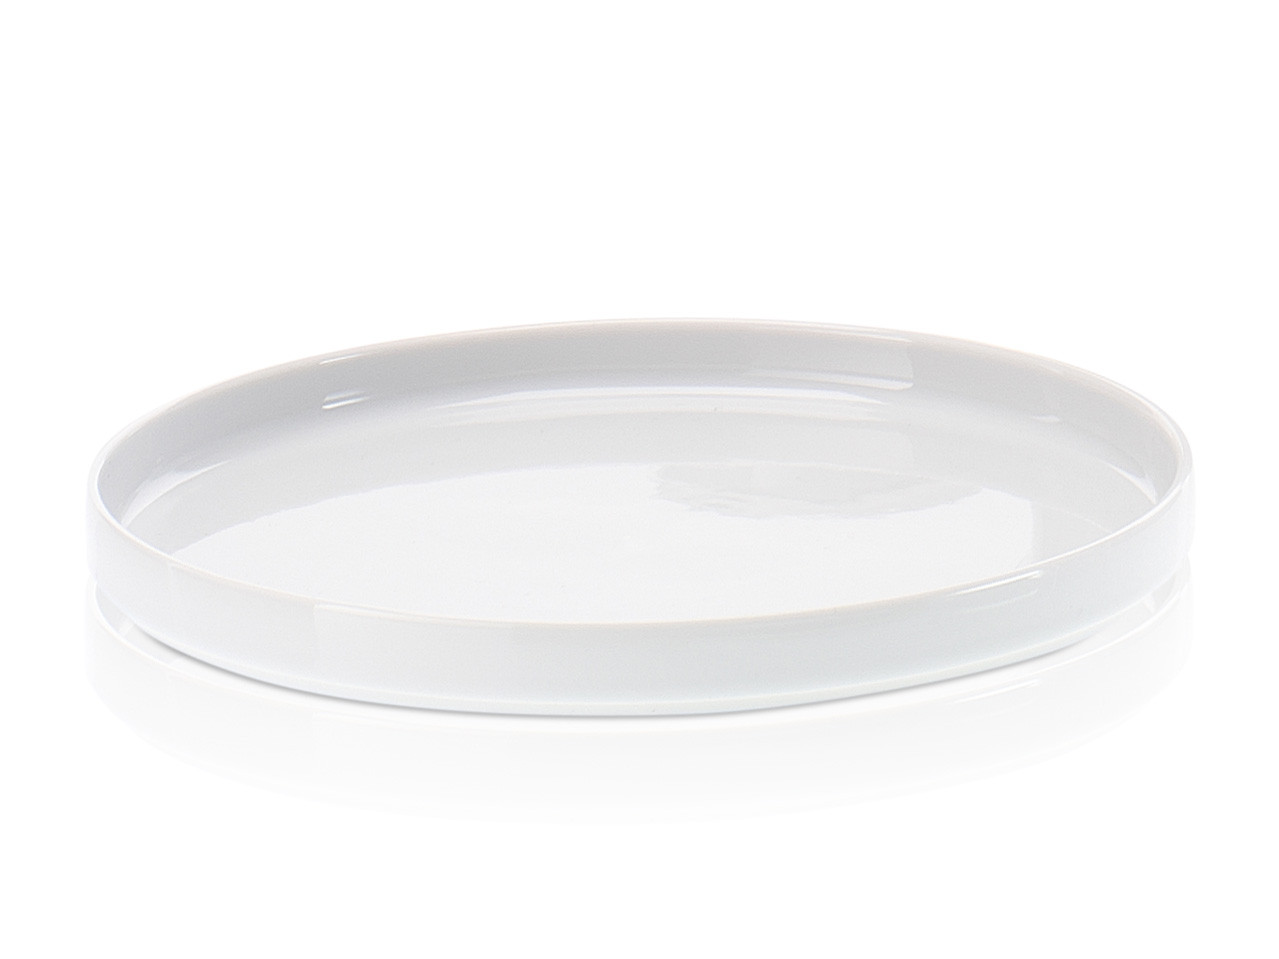 Tacka łazienkowa Decor Walther TAB M Porcelain White